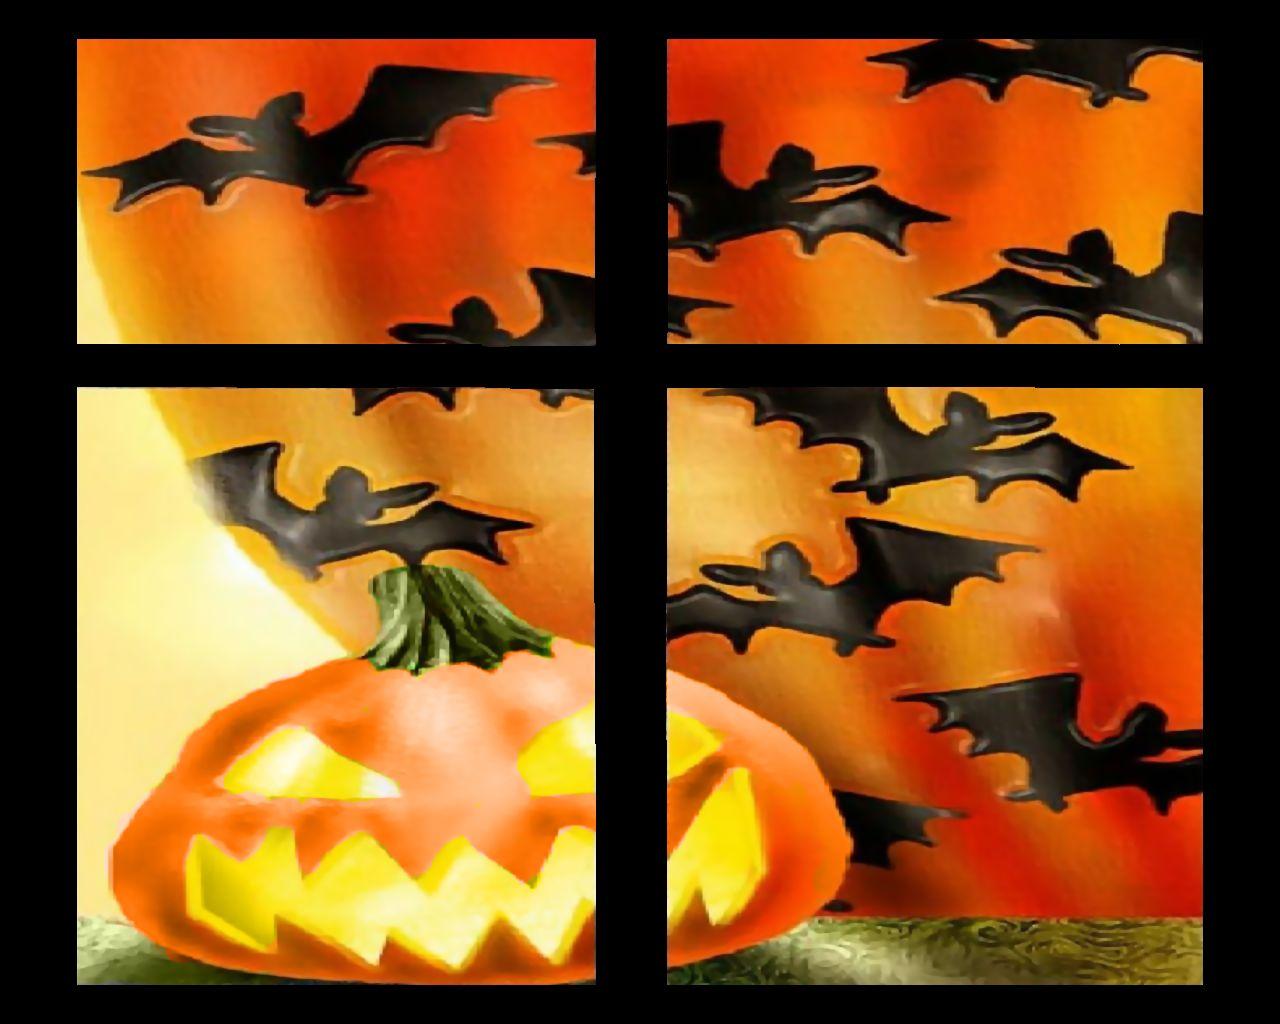 desktop wallpaper halloween   SF Wallpaper 1280x1024